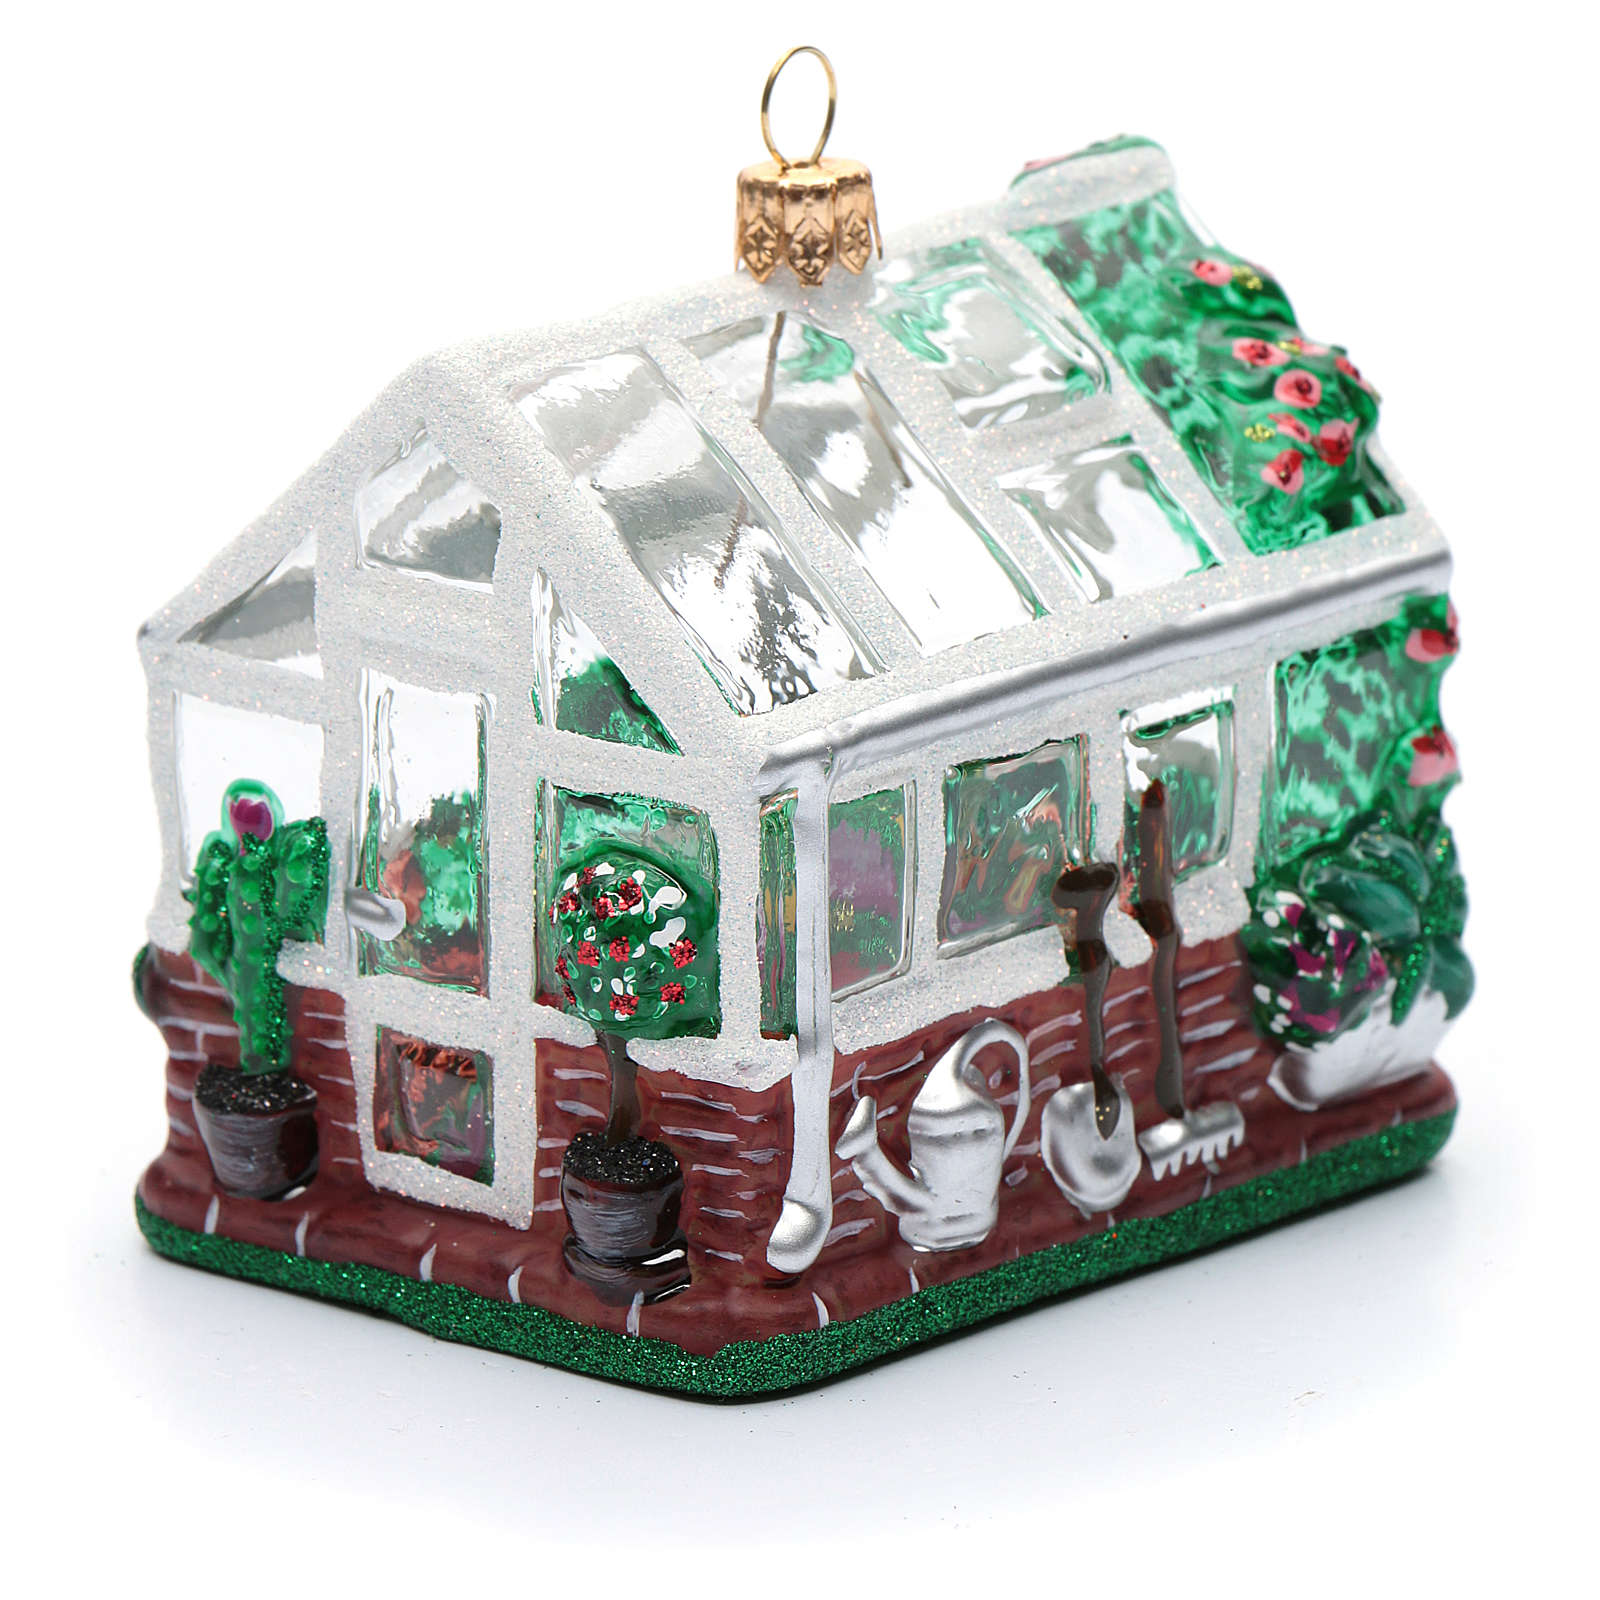 Blown glass Christmas ornament, greenhouse 4